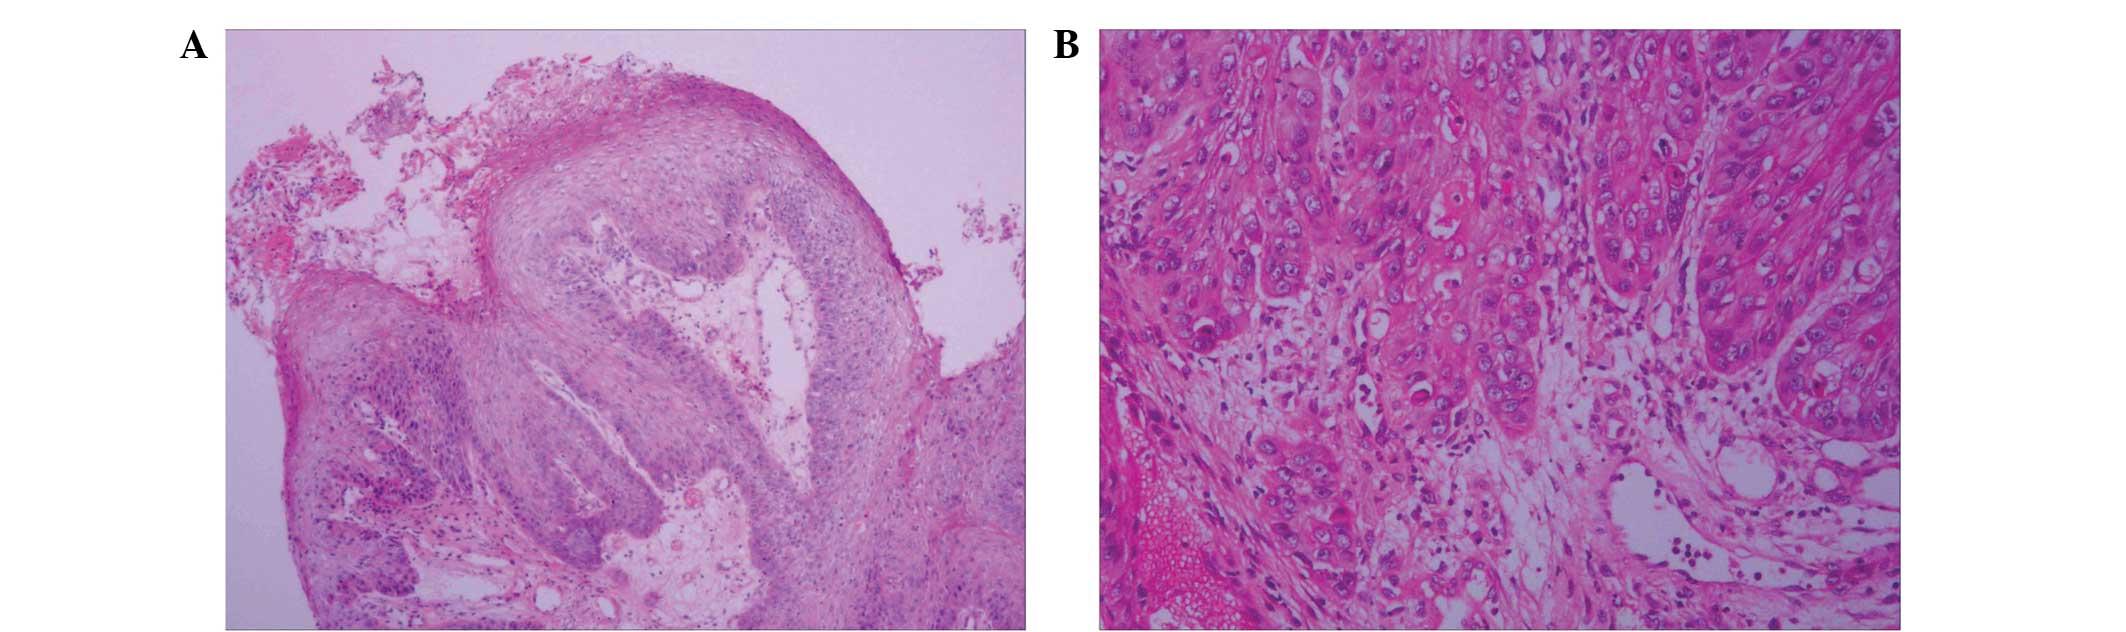 papilloma vs squamous cell carcinoma